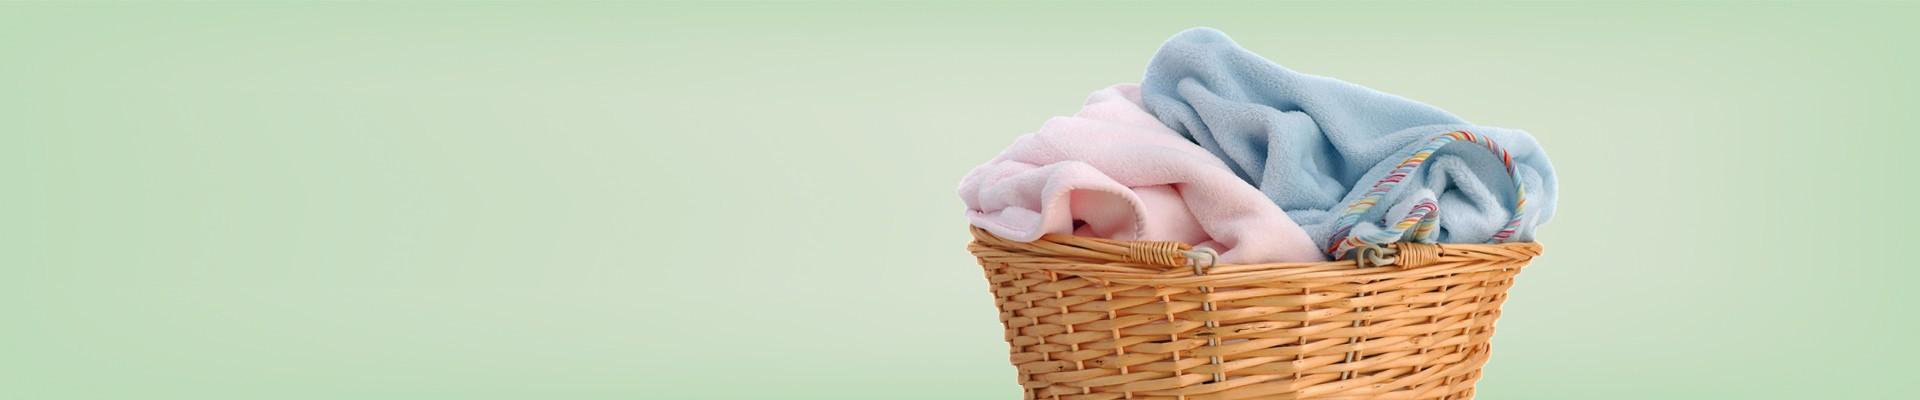 Jual Selimut & Bedong Bayi - Harga Terbaik